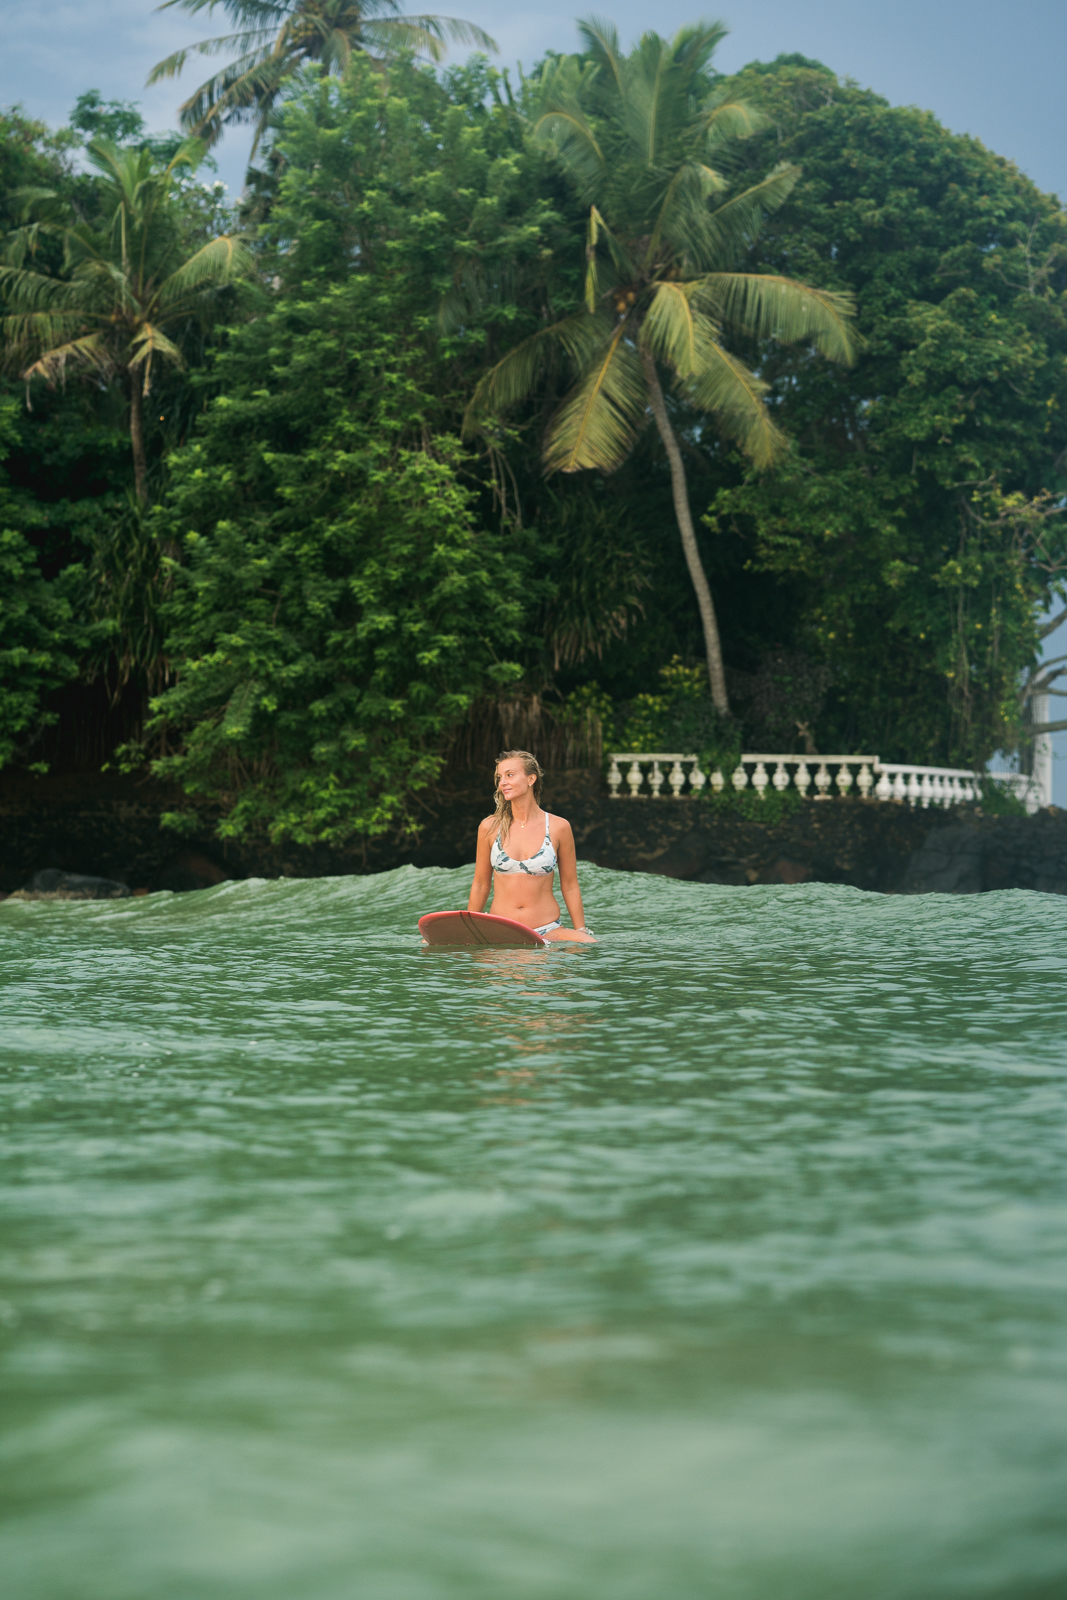 island-surfing-sri-lanka.jpg